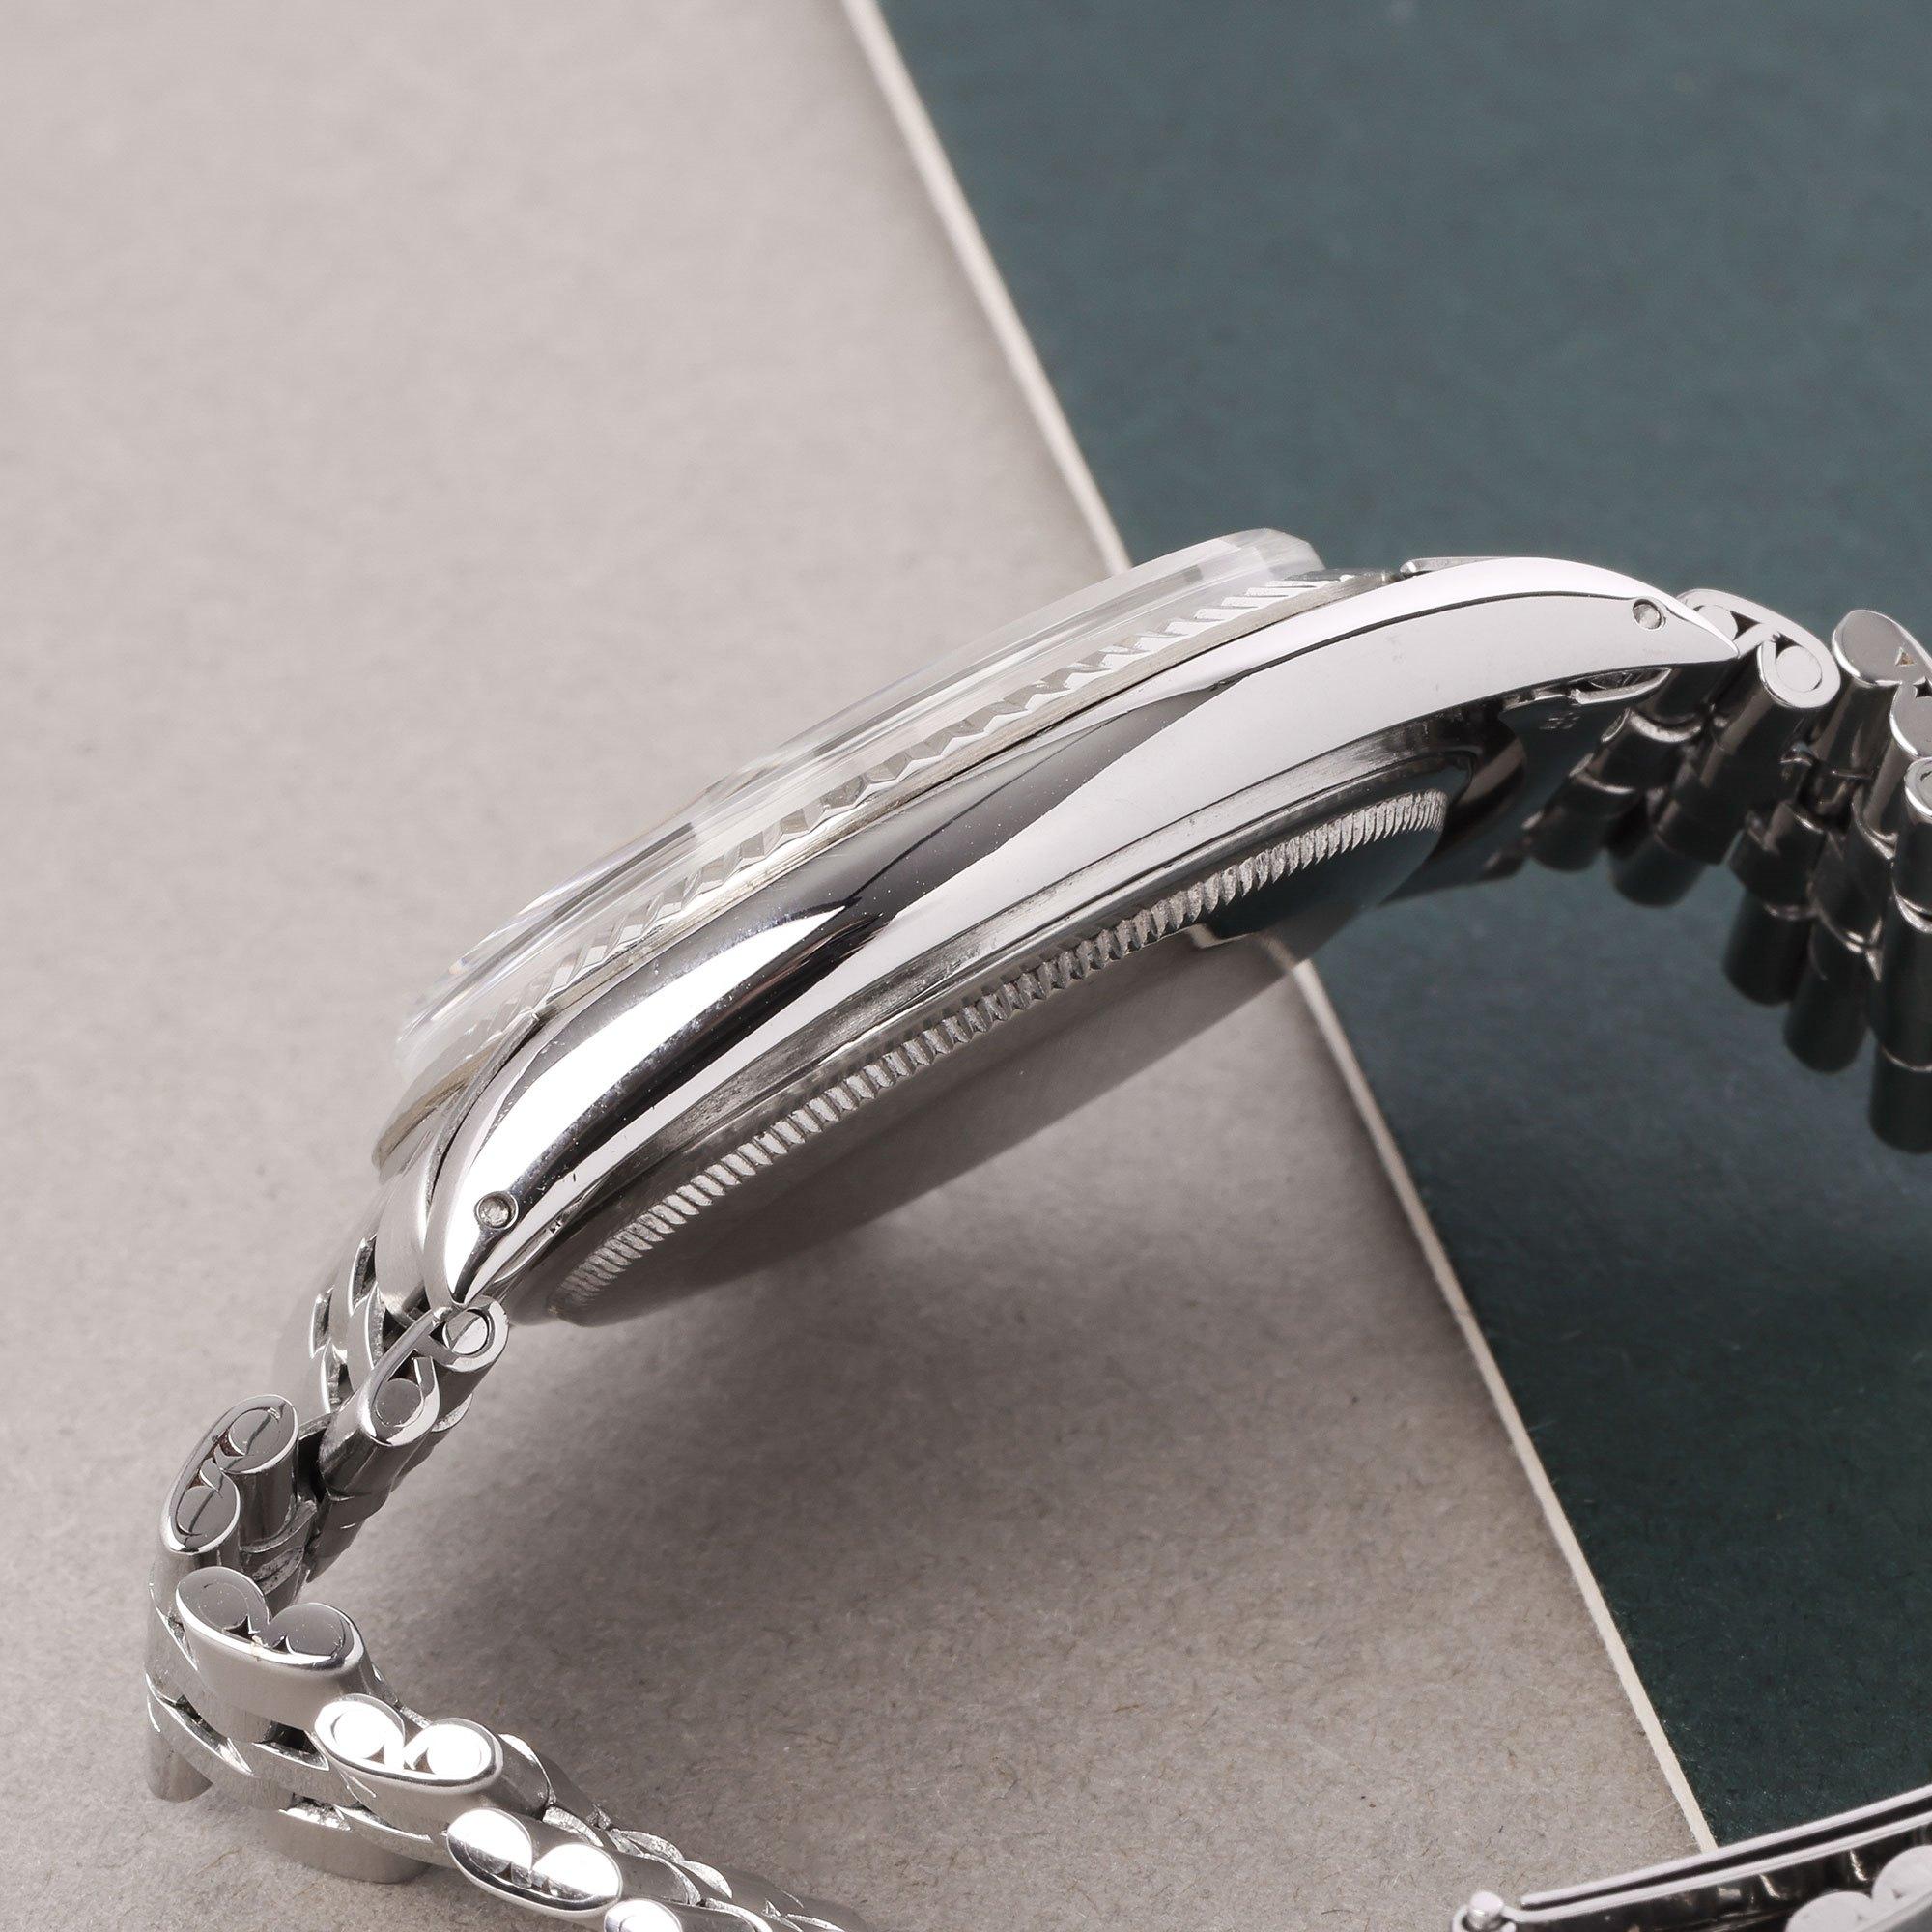 Rolex Datejust 36 Sword Hands 18K White Gold & Stainless Steel 1601